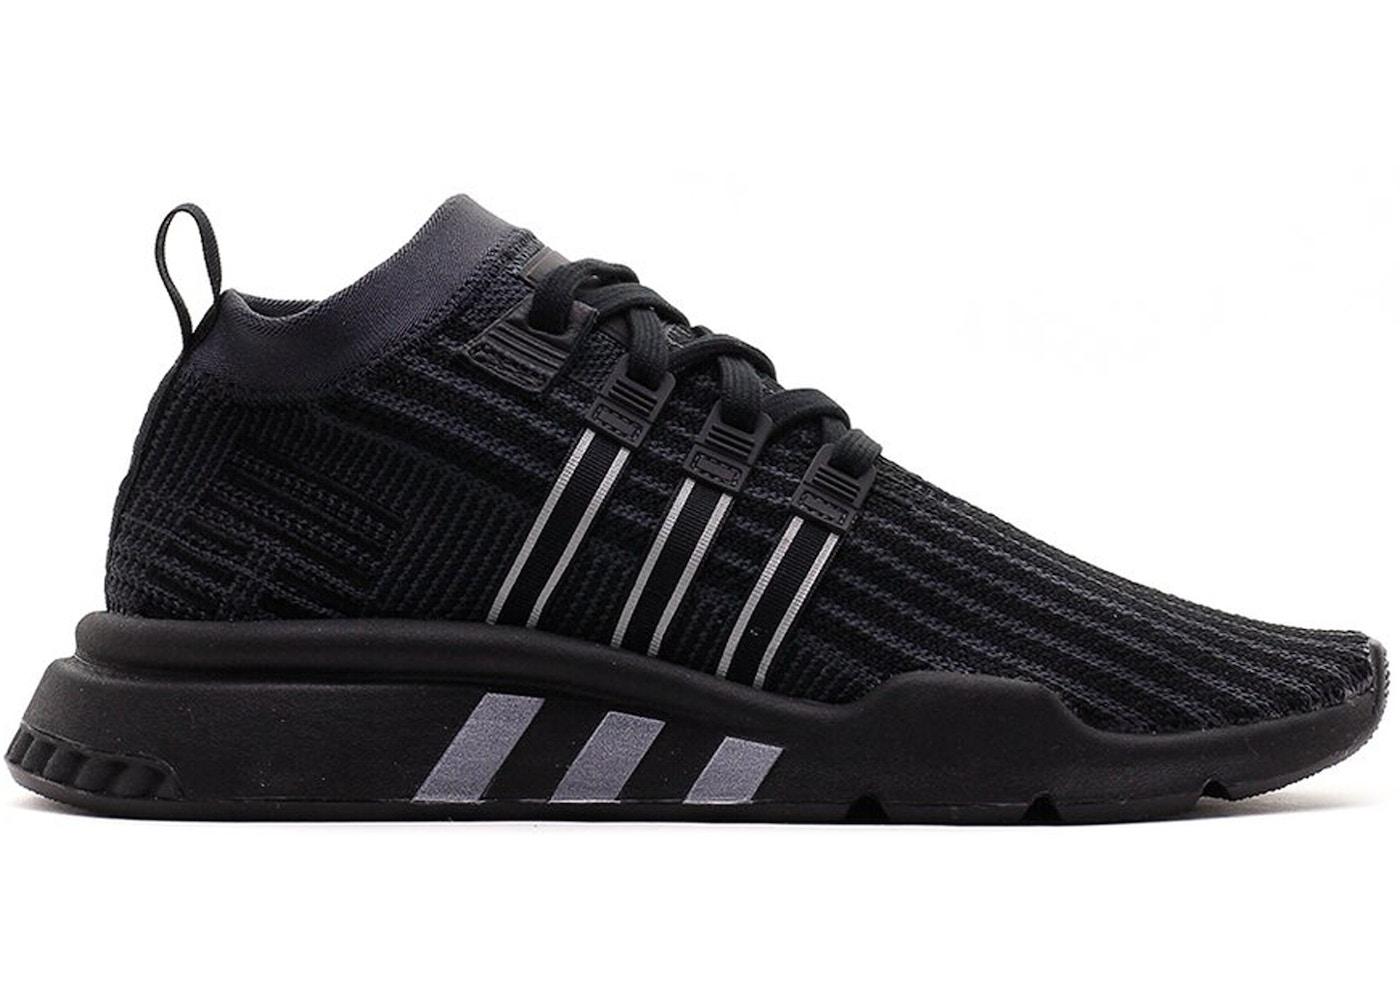 adidas EQT Support Mid Adv Core Black Carbon